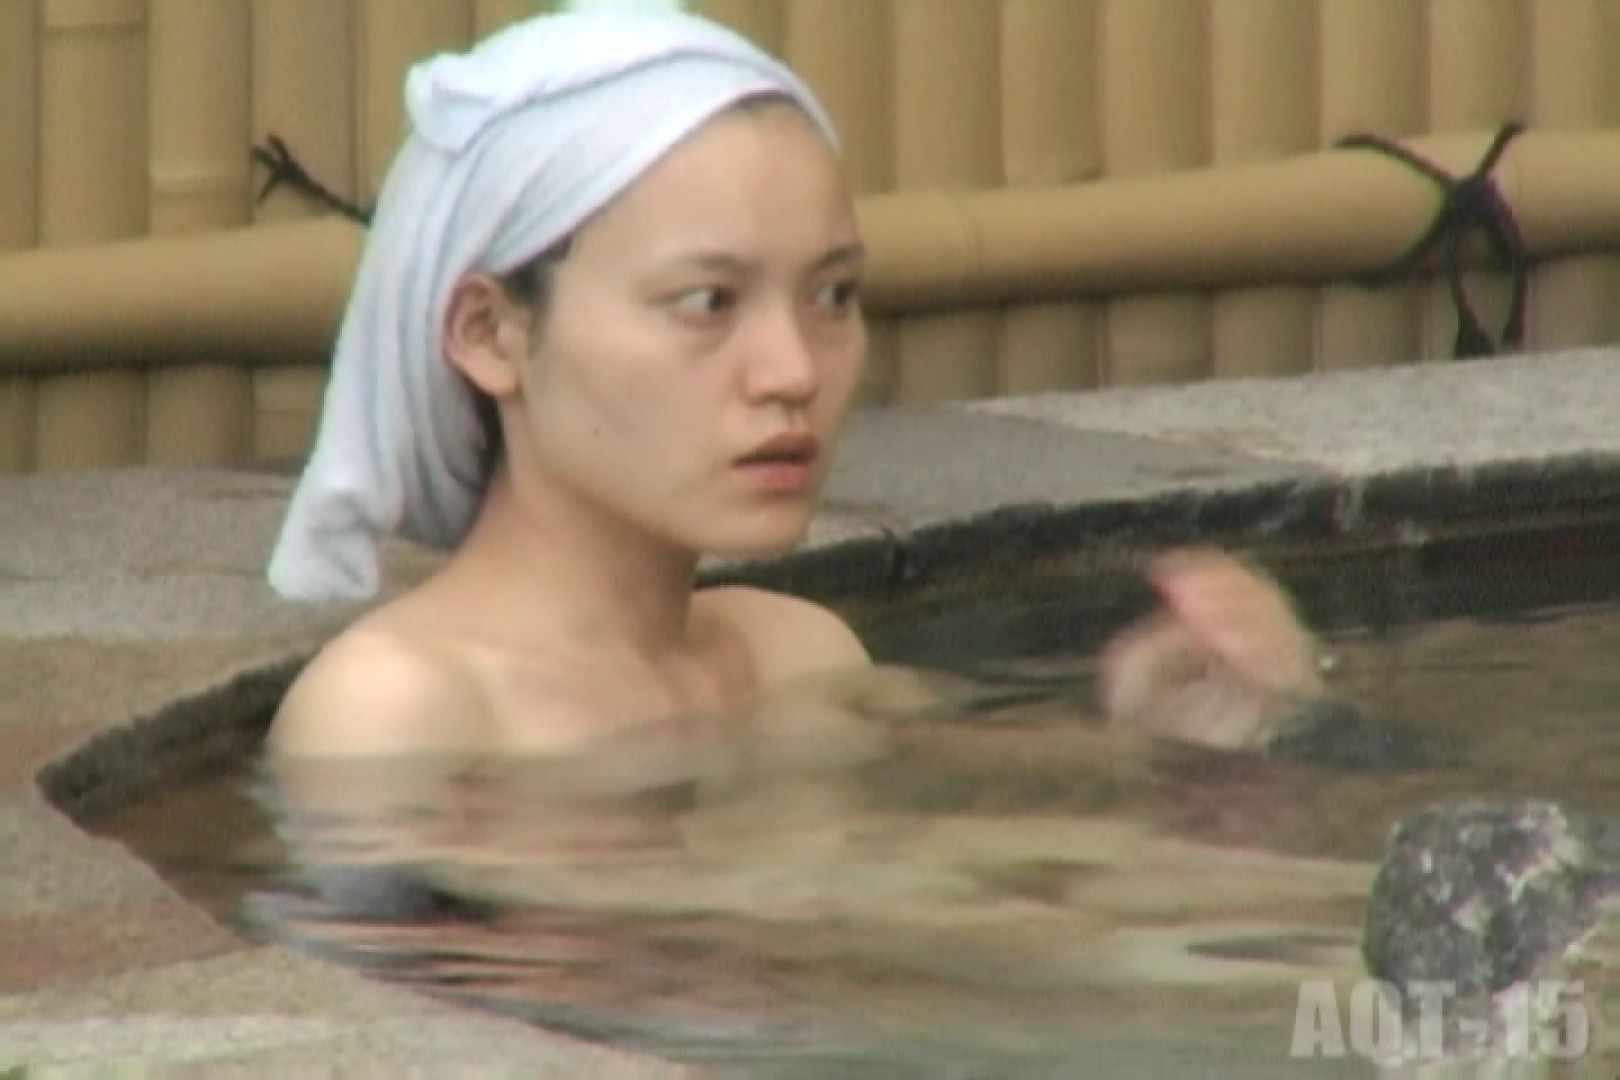 Aquaな露天風呂Vol.836 OLのエロ生活 オメコ動画キャプチャ 101連発 44